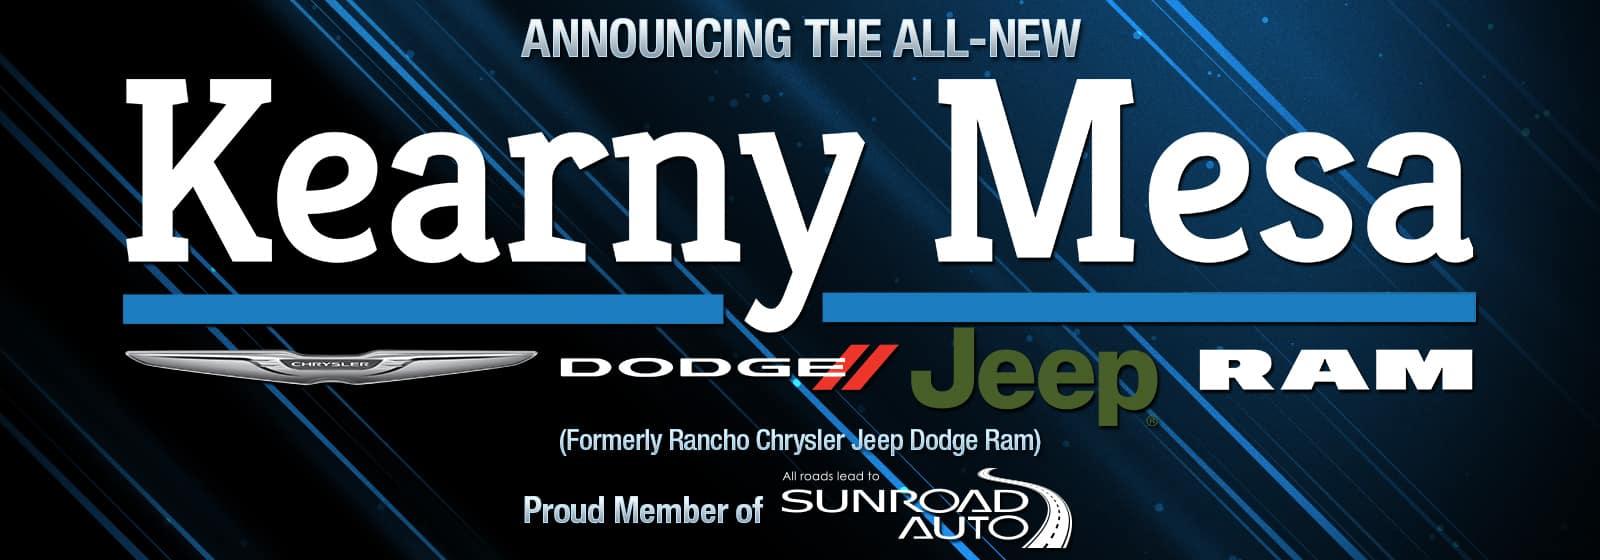 Dodge Dealership San Diego >> Kearny Mesa Chrysler Dodge Jeep Ram | New & Used Cars ...